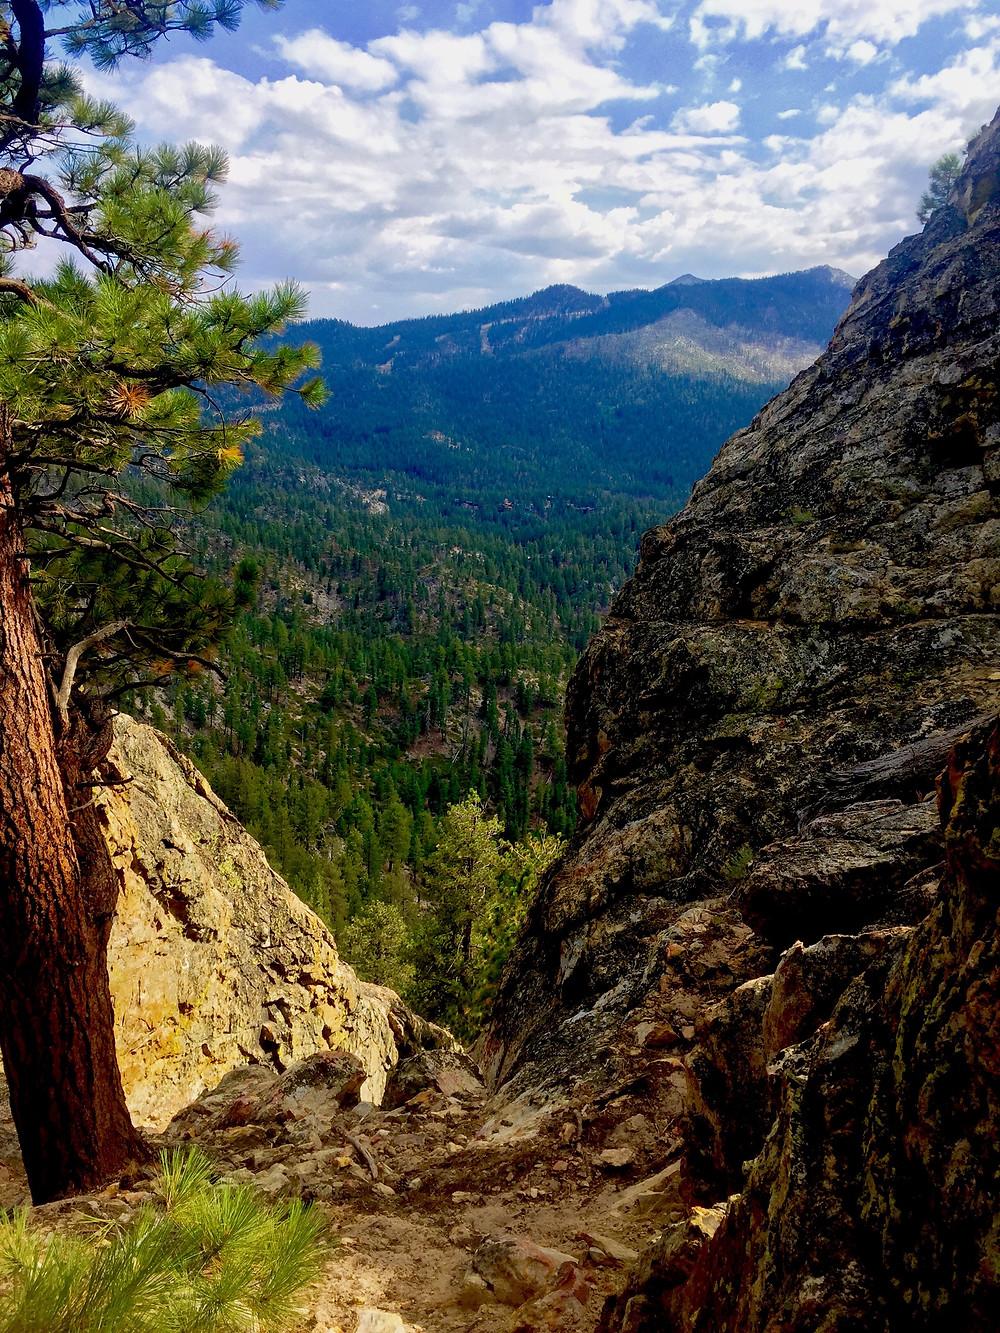 Take a hike, preferably around Tahoe.